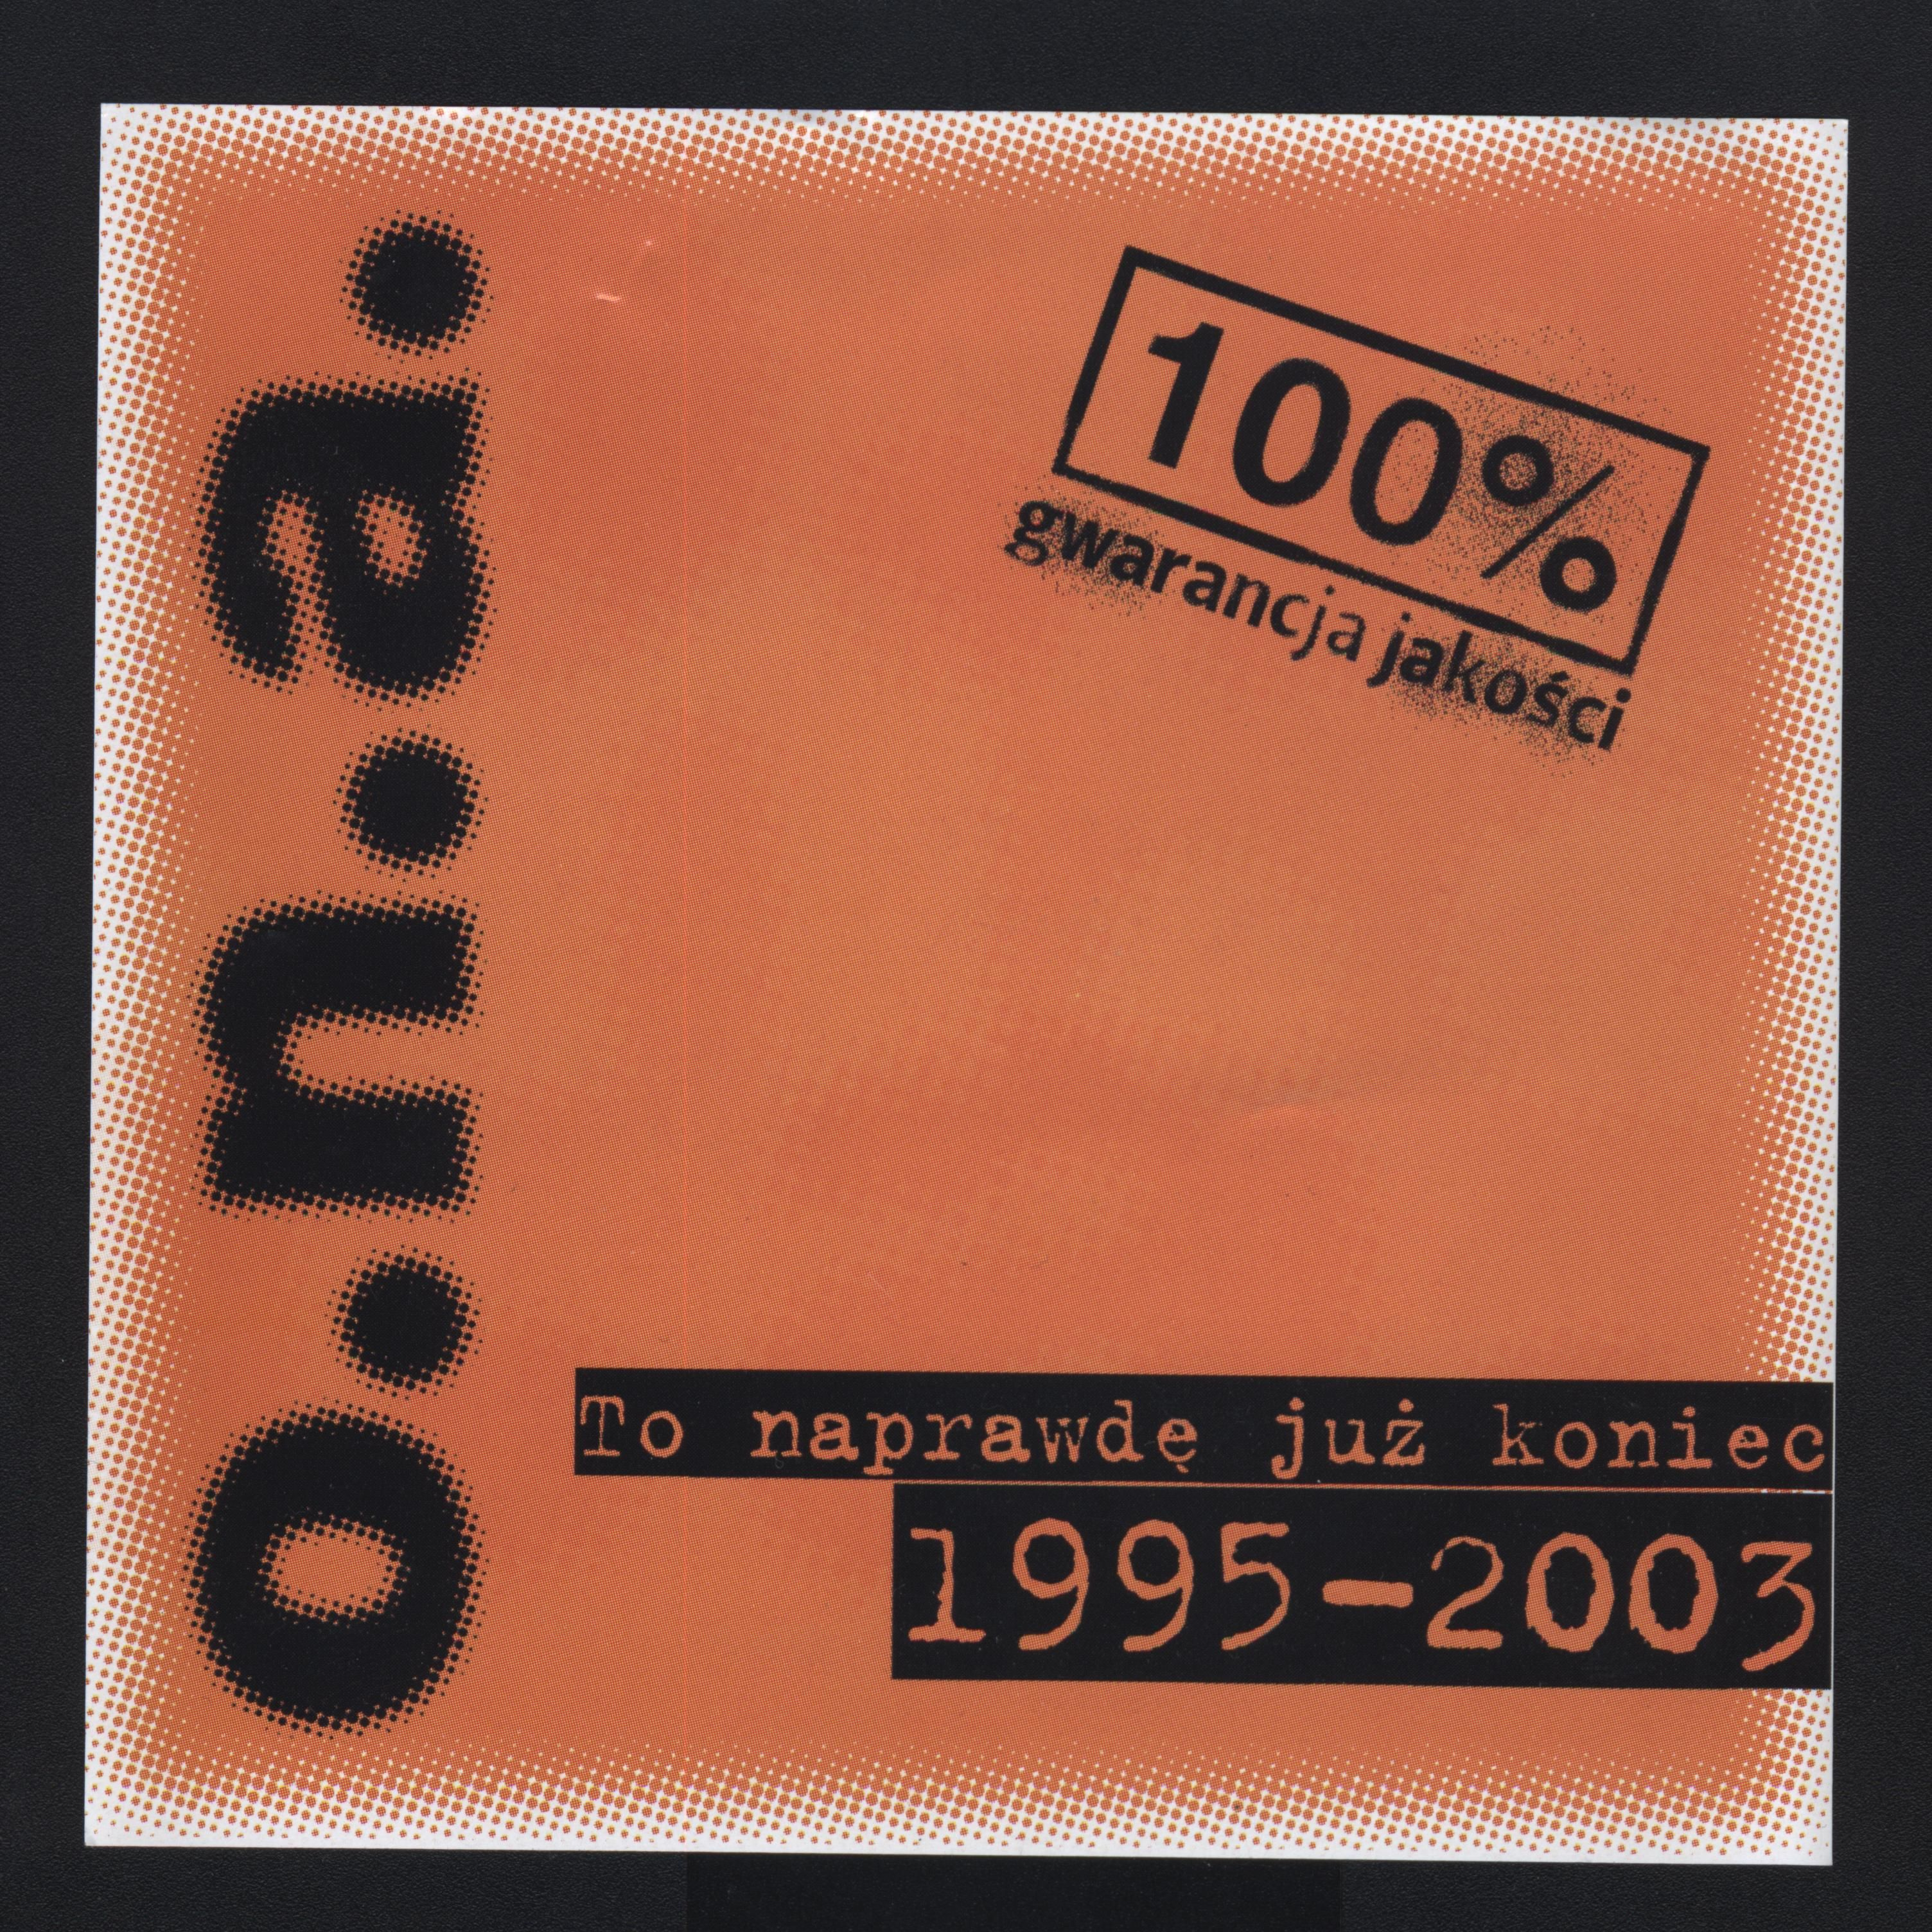 O.n.a. - To Naprawdę Już Koniec 1995 - 2003 album cover